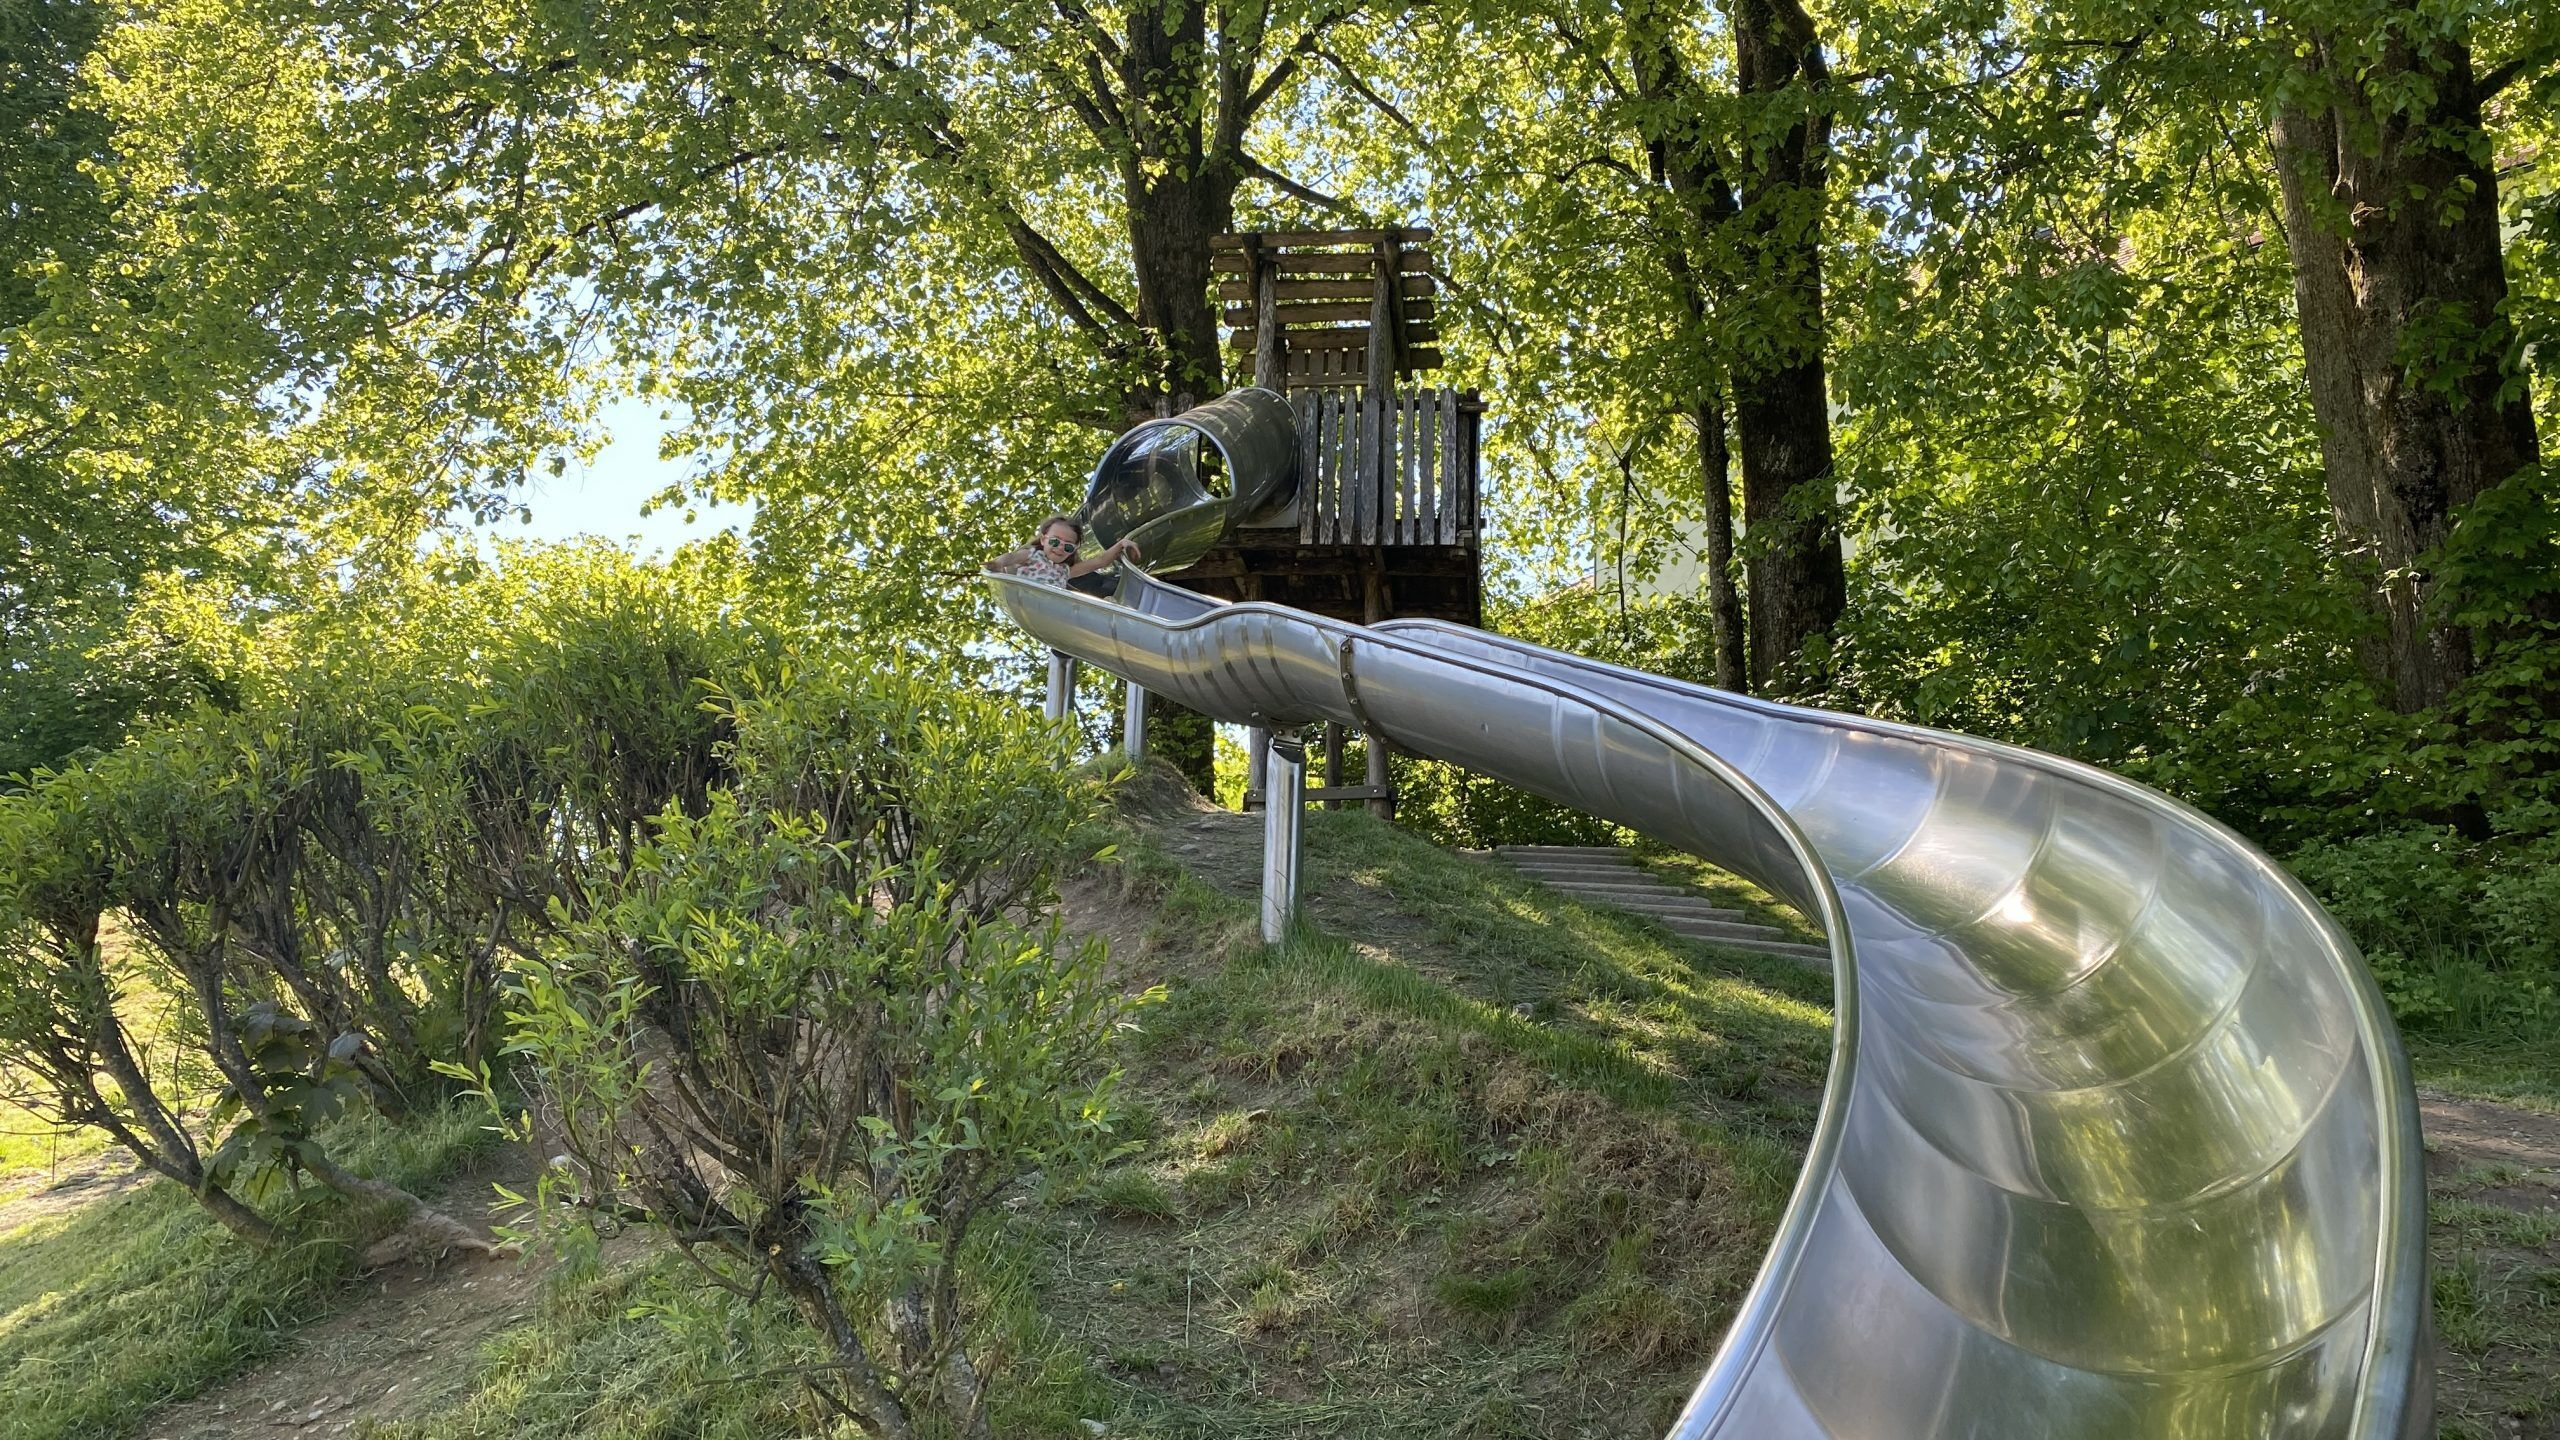 Abenteuerspielplatz Alpsee Rutsche